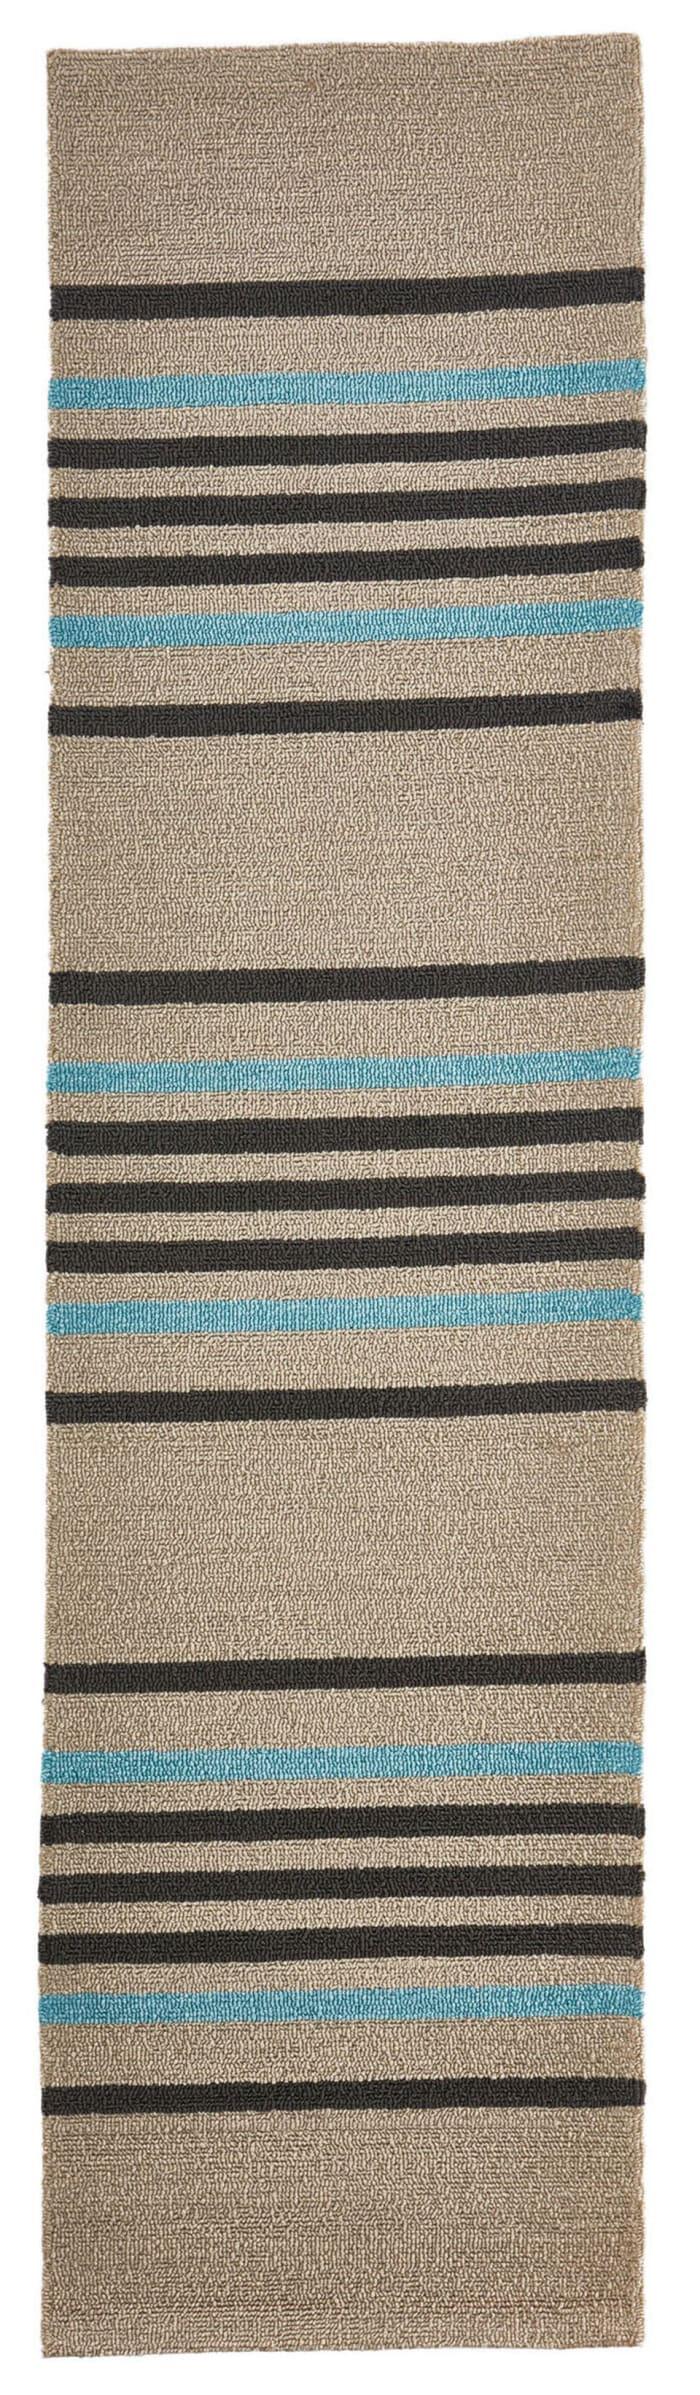 Brown & Blue Striped Runner 2' x 8'